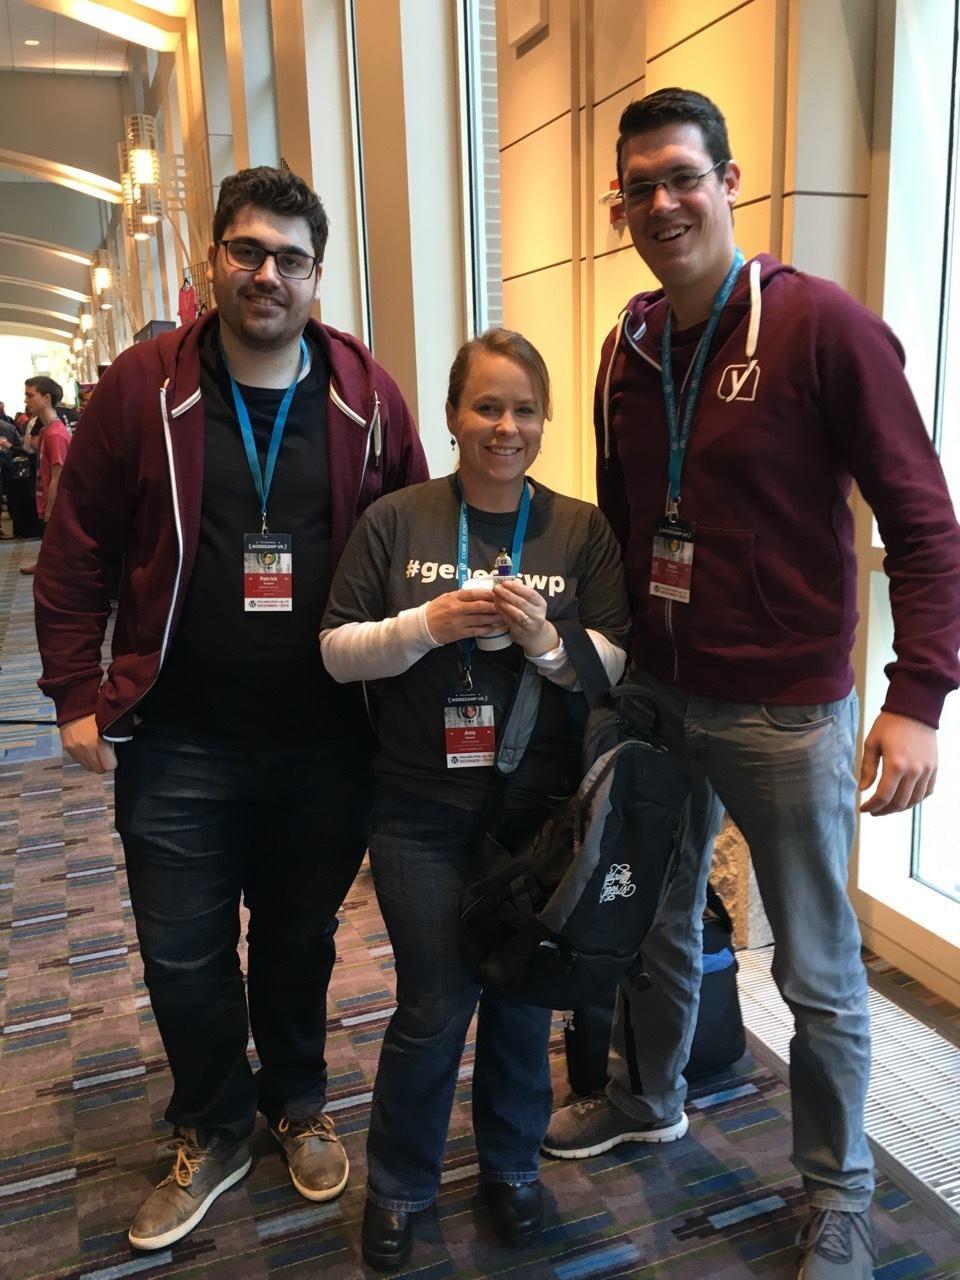 Meeting members of the Yoast Team at WordCamp US.